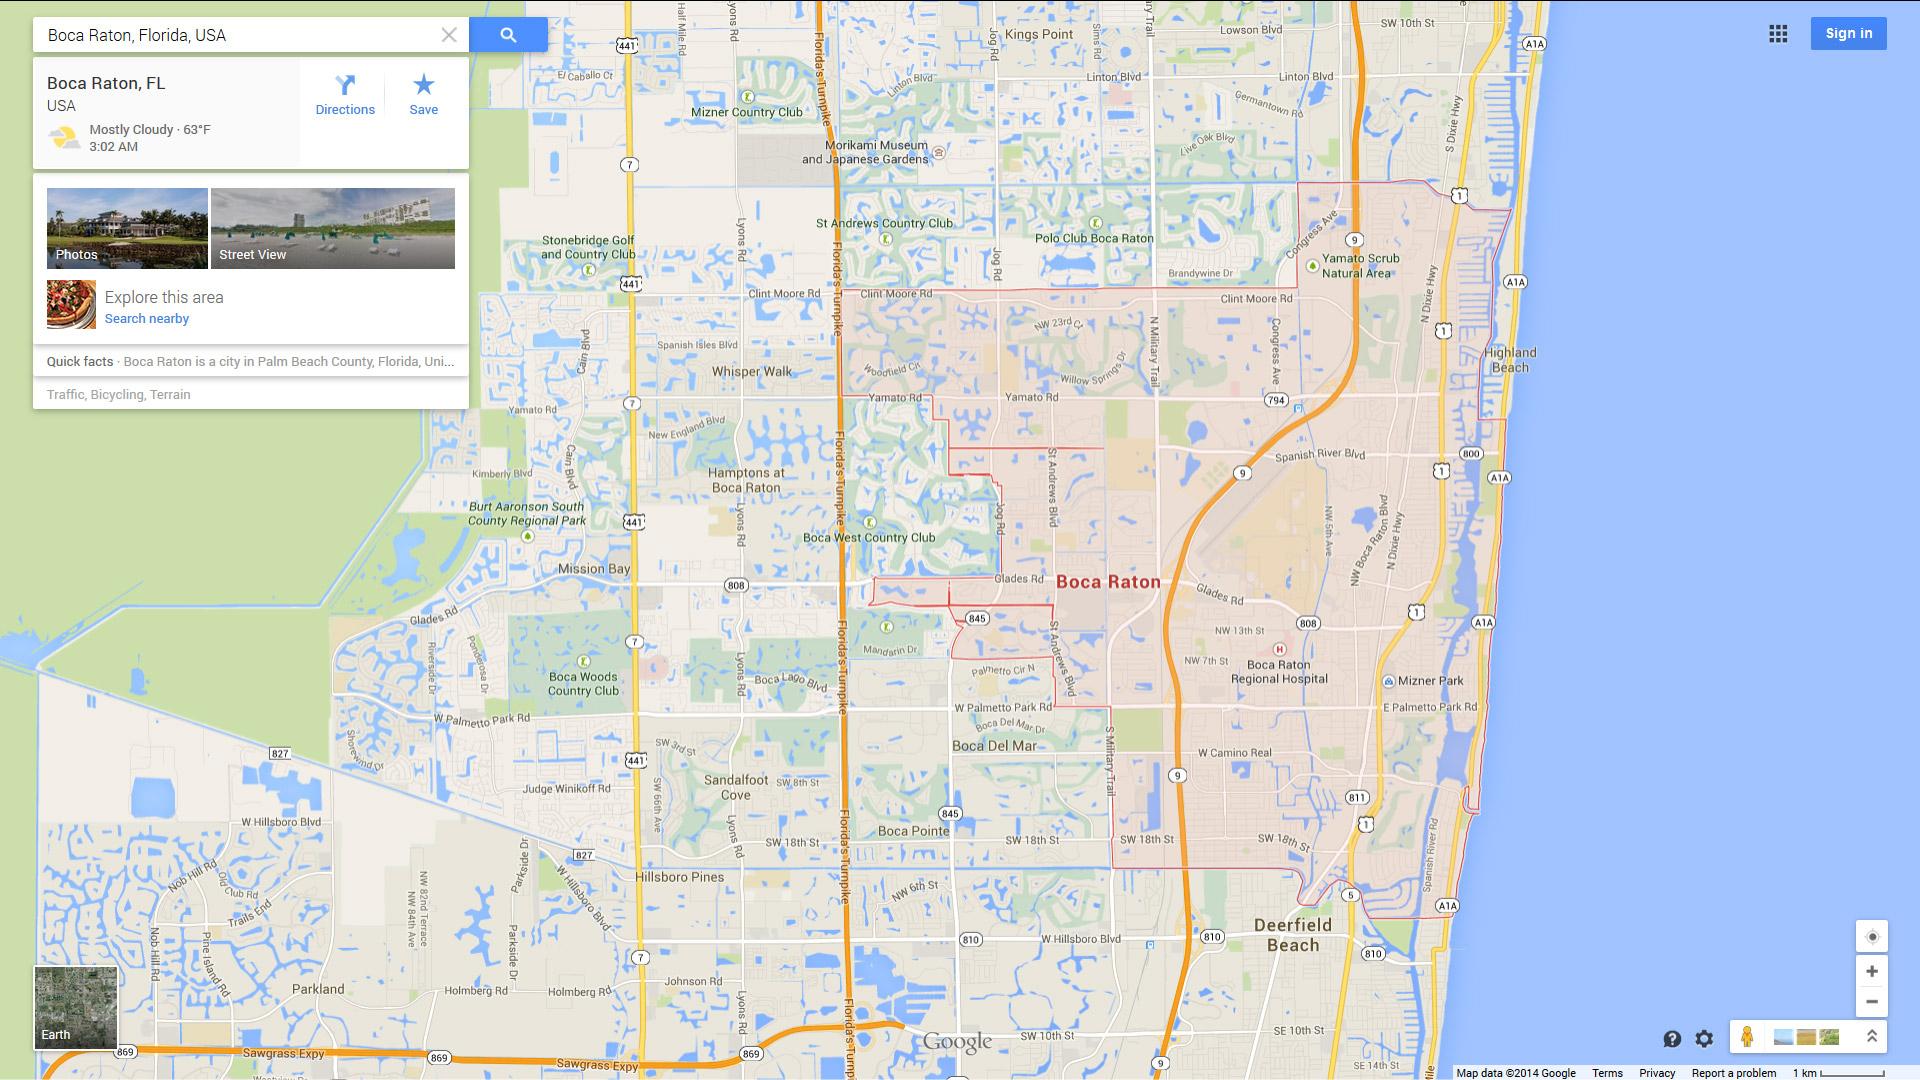 Boca Raton, Florida Map - Boca Florida Map